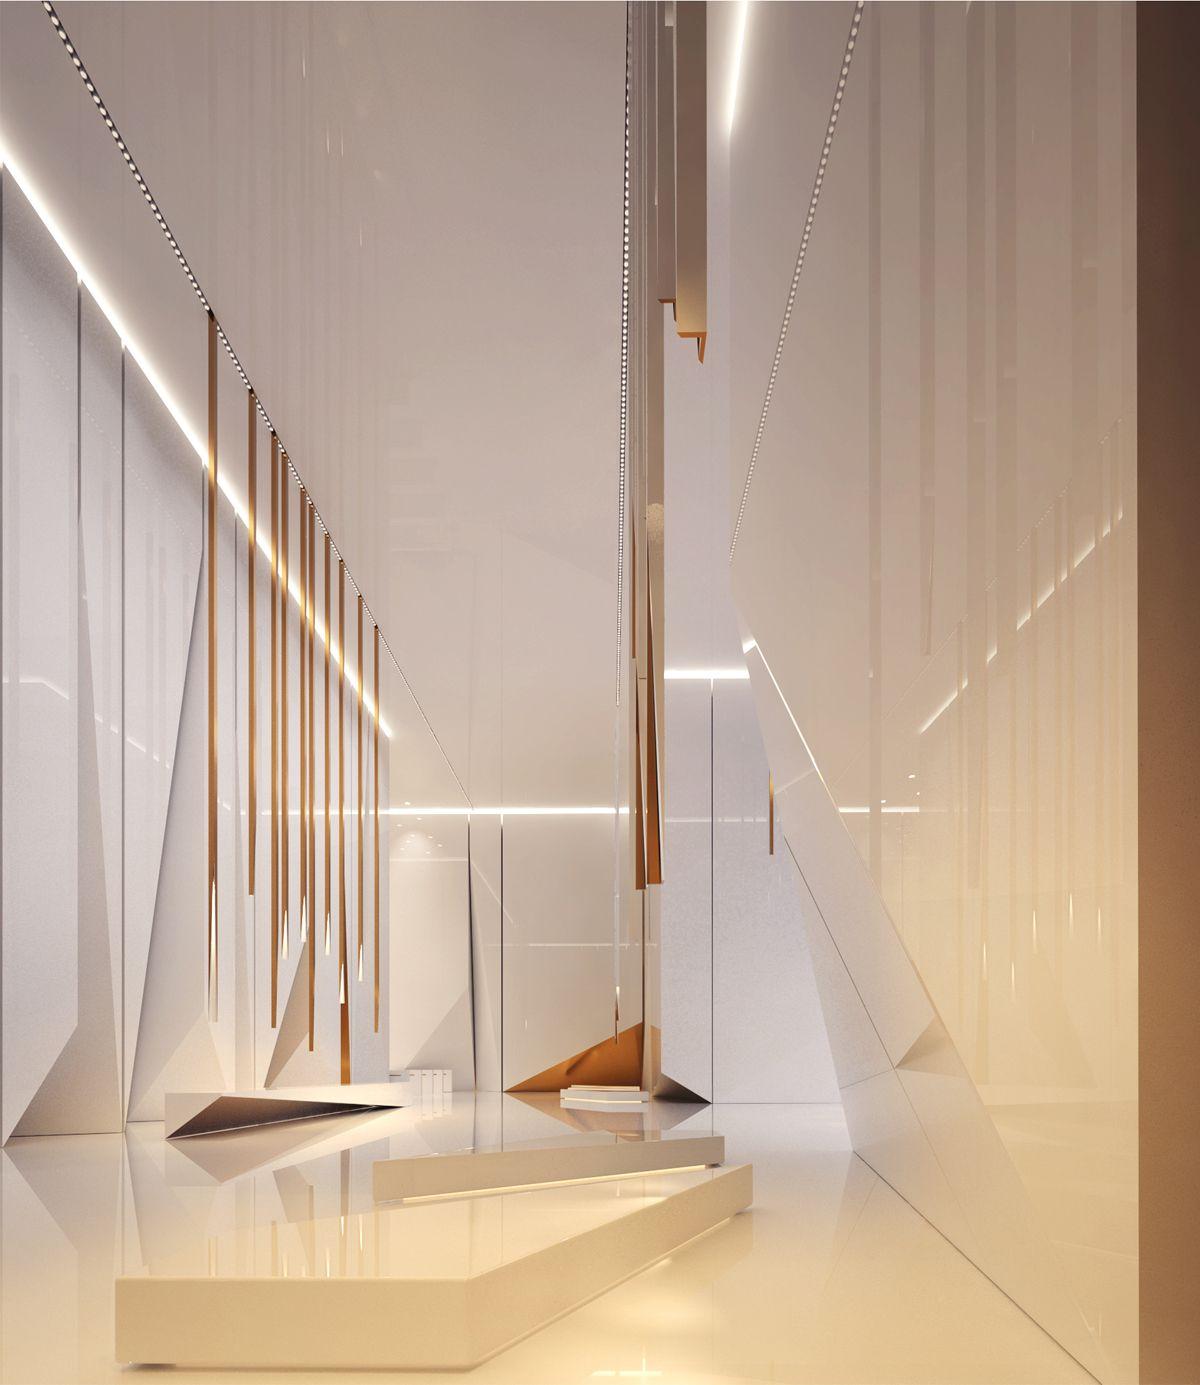 Lobby space on behance design hall interior also modern office interiors ideas hospitality rh pinterest